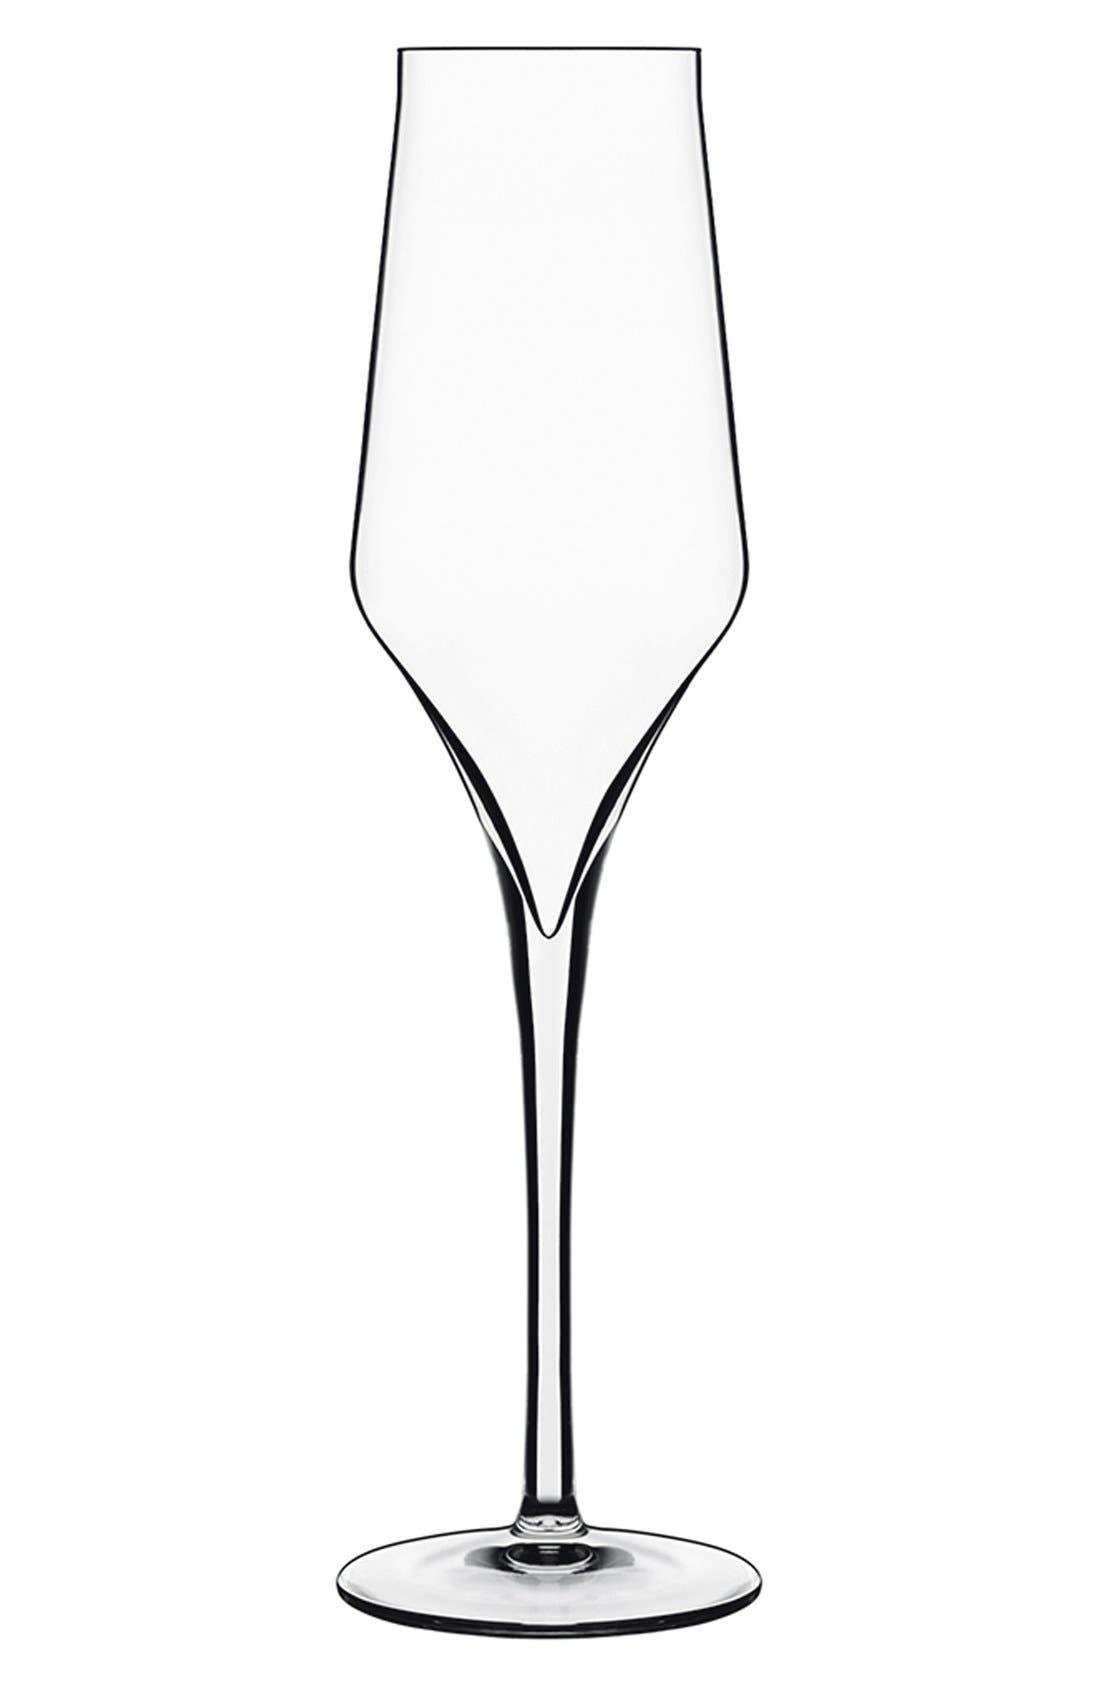 Alternate Image 1 Selected - Luigi Bormioli 'Supremo' Champagne Flutes (Set of 6)